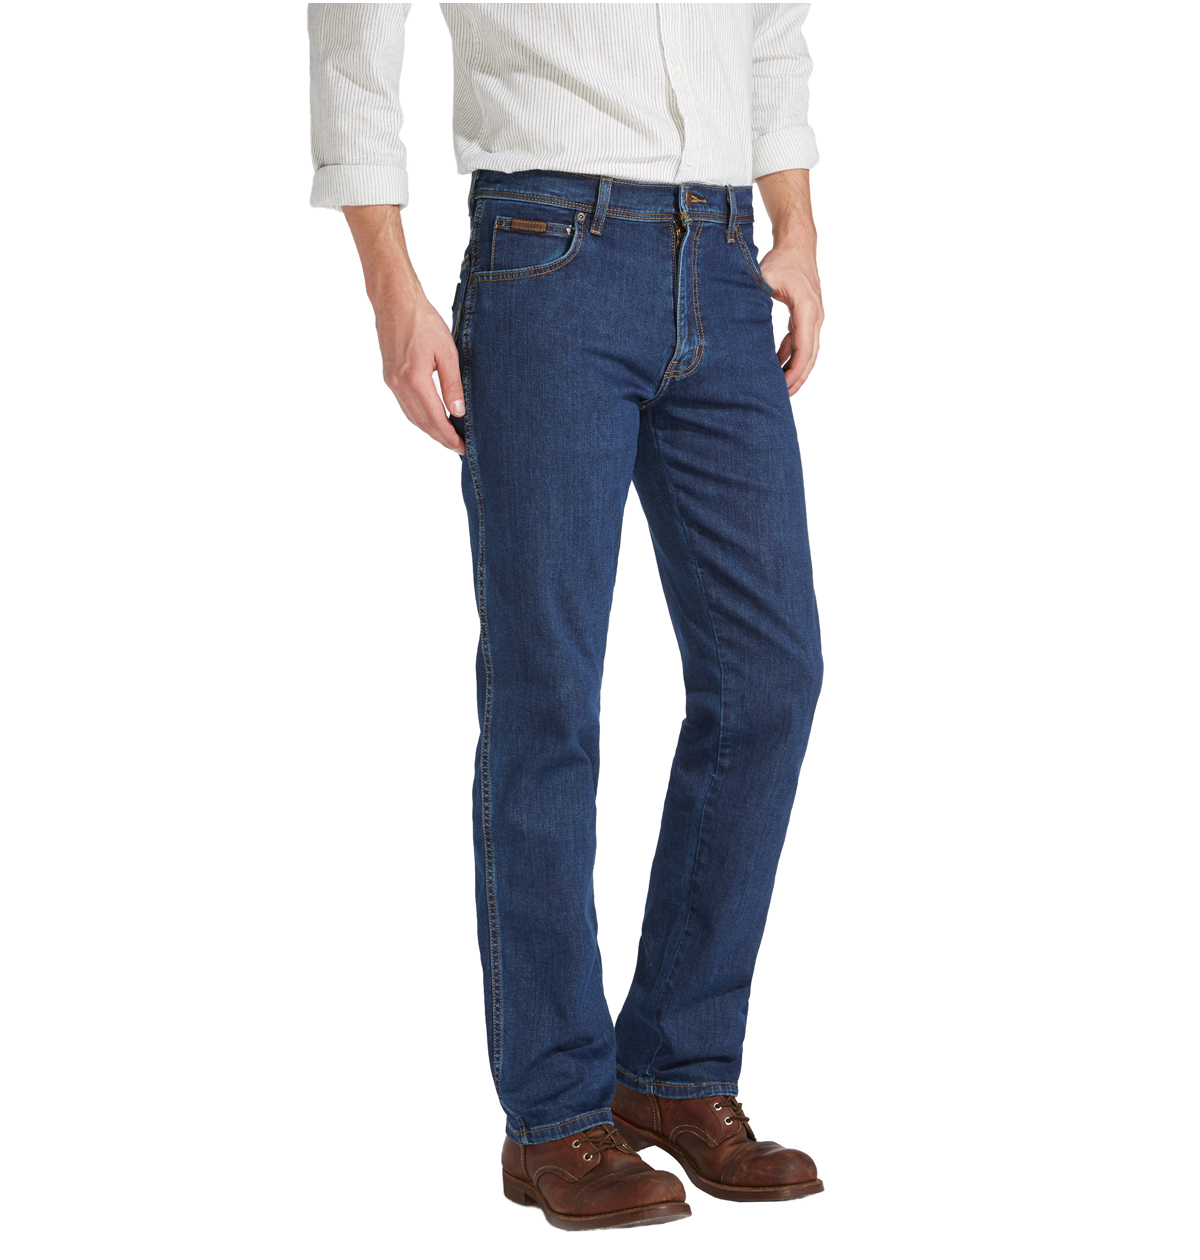 Pantalon Vaquero Wrangler Texas Original Straight Darkstone